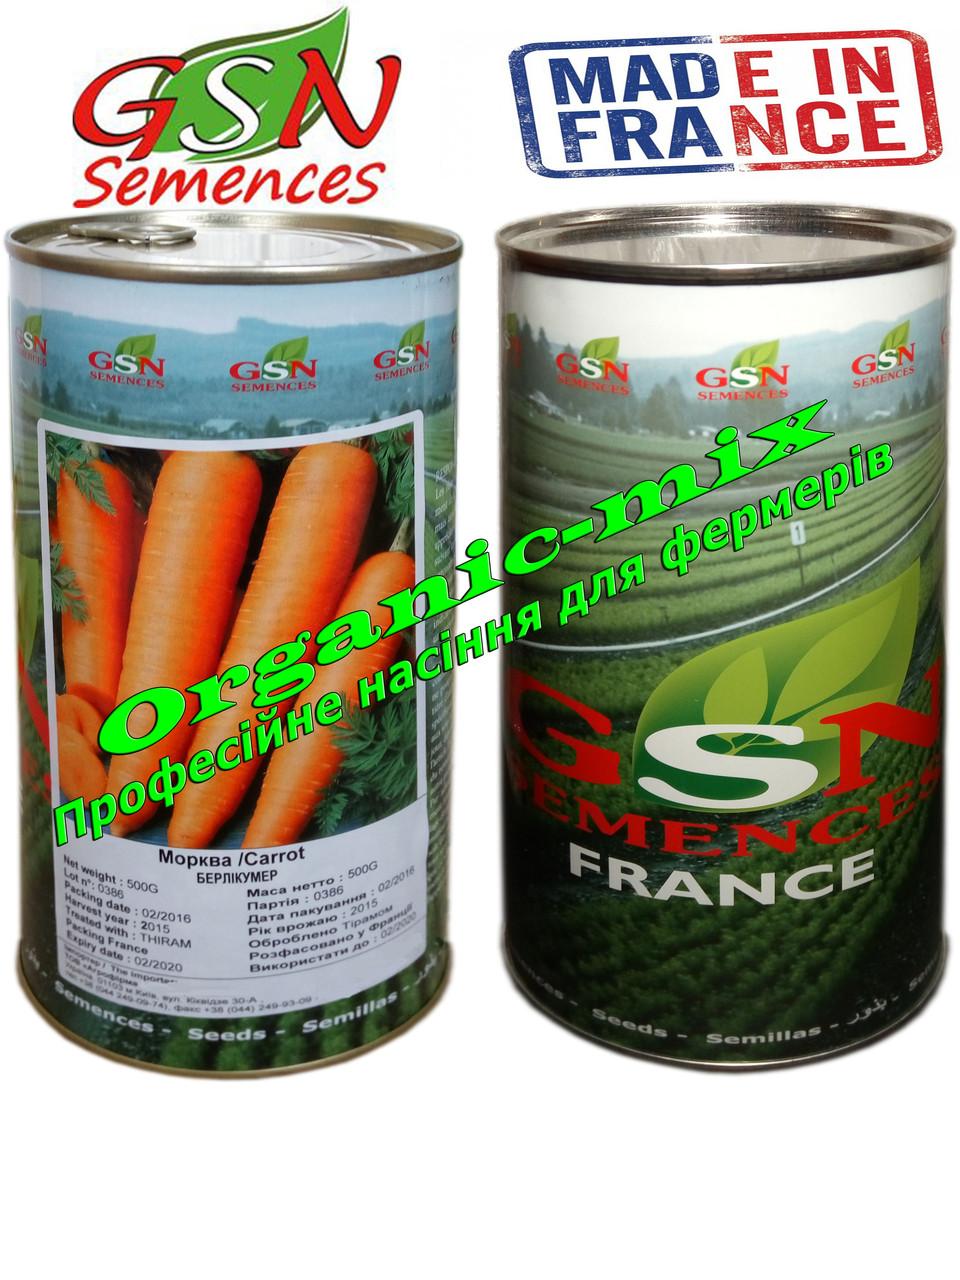 Морковь поздняя Берликумер, банка 500 грамм, GSN Semences (Франция)